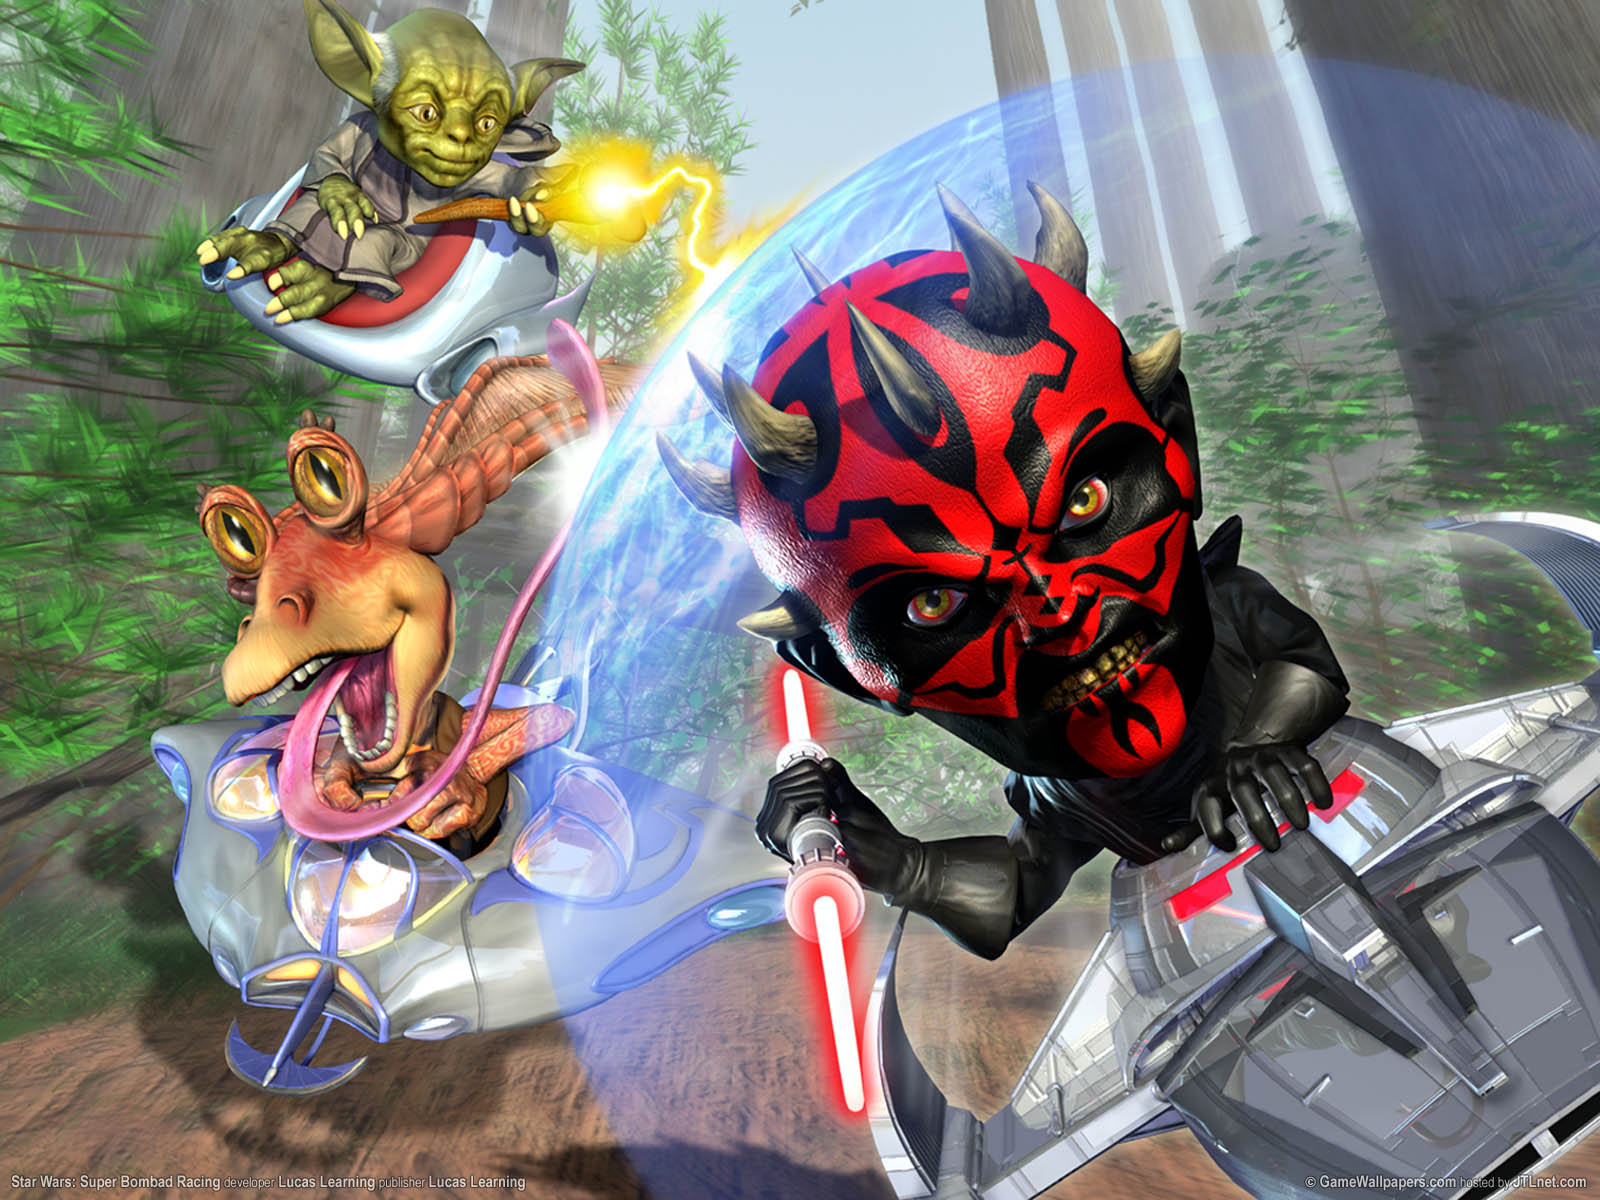 Star Wars: Super Bombad Racing wallpaper 02 1600x1200